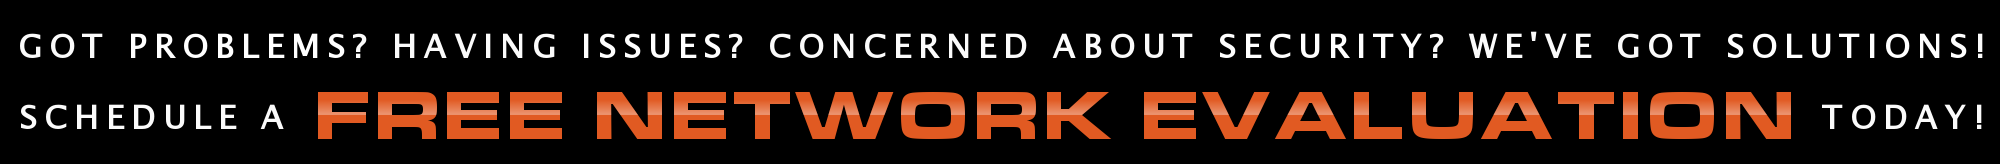 Free Computer Network Evaluation - No Obligation - New Hampshire - Massachusetts IT Company